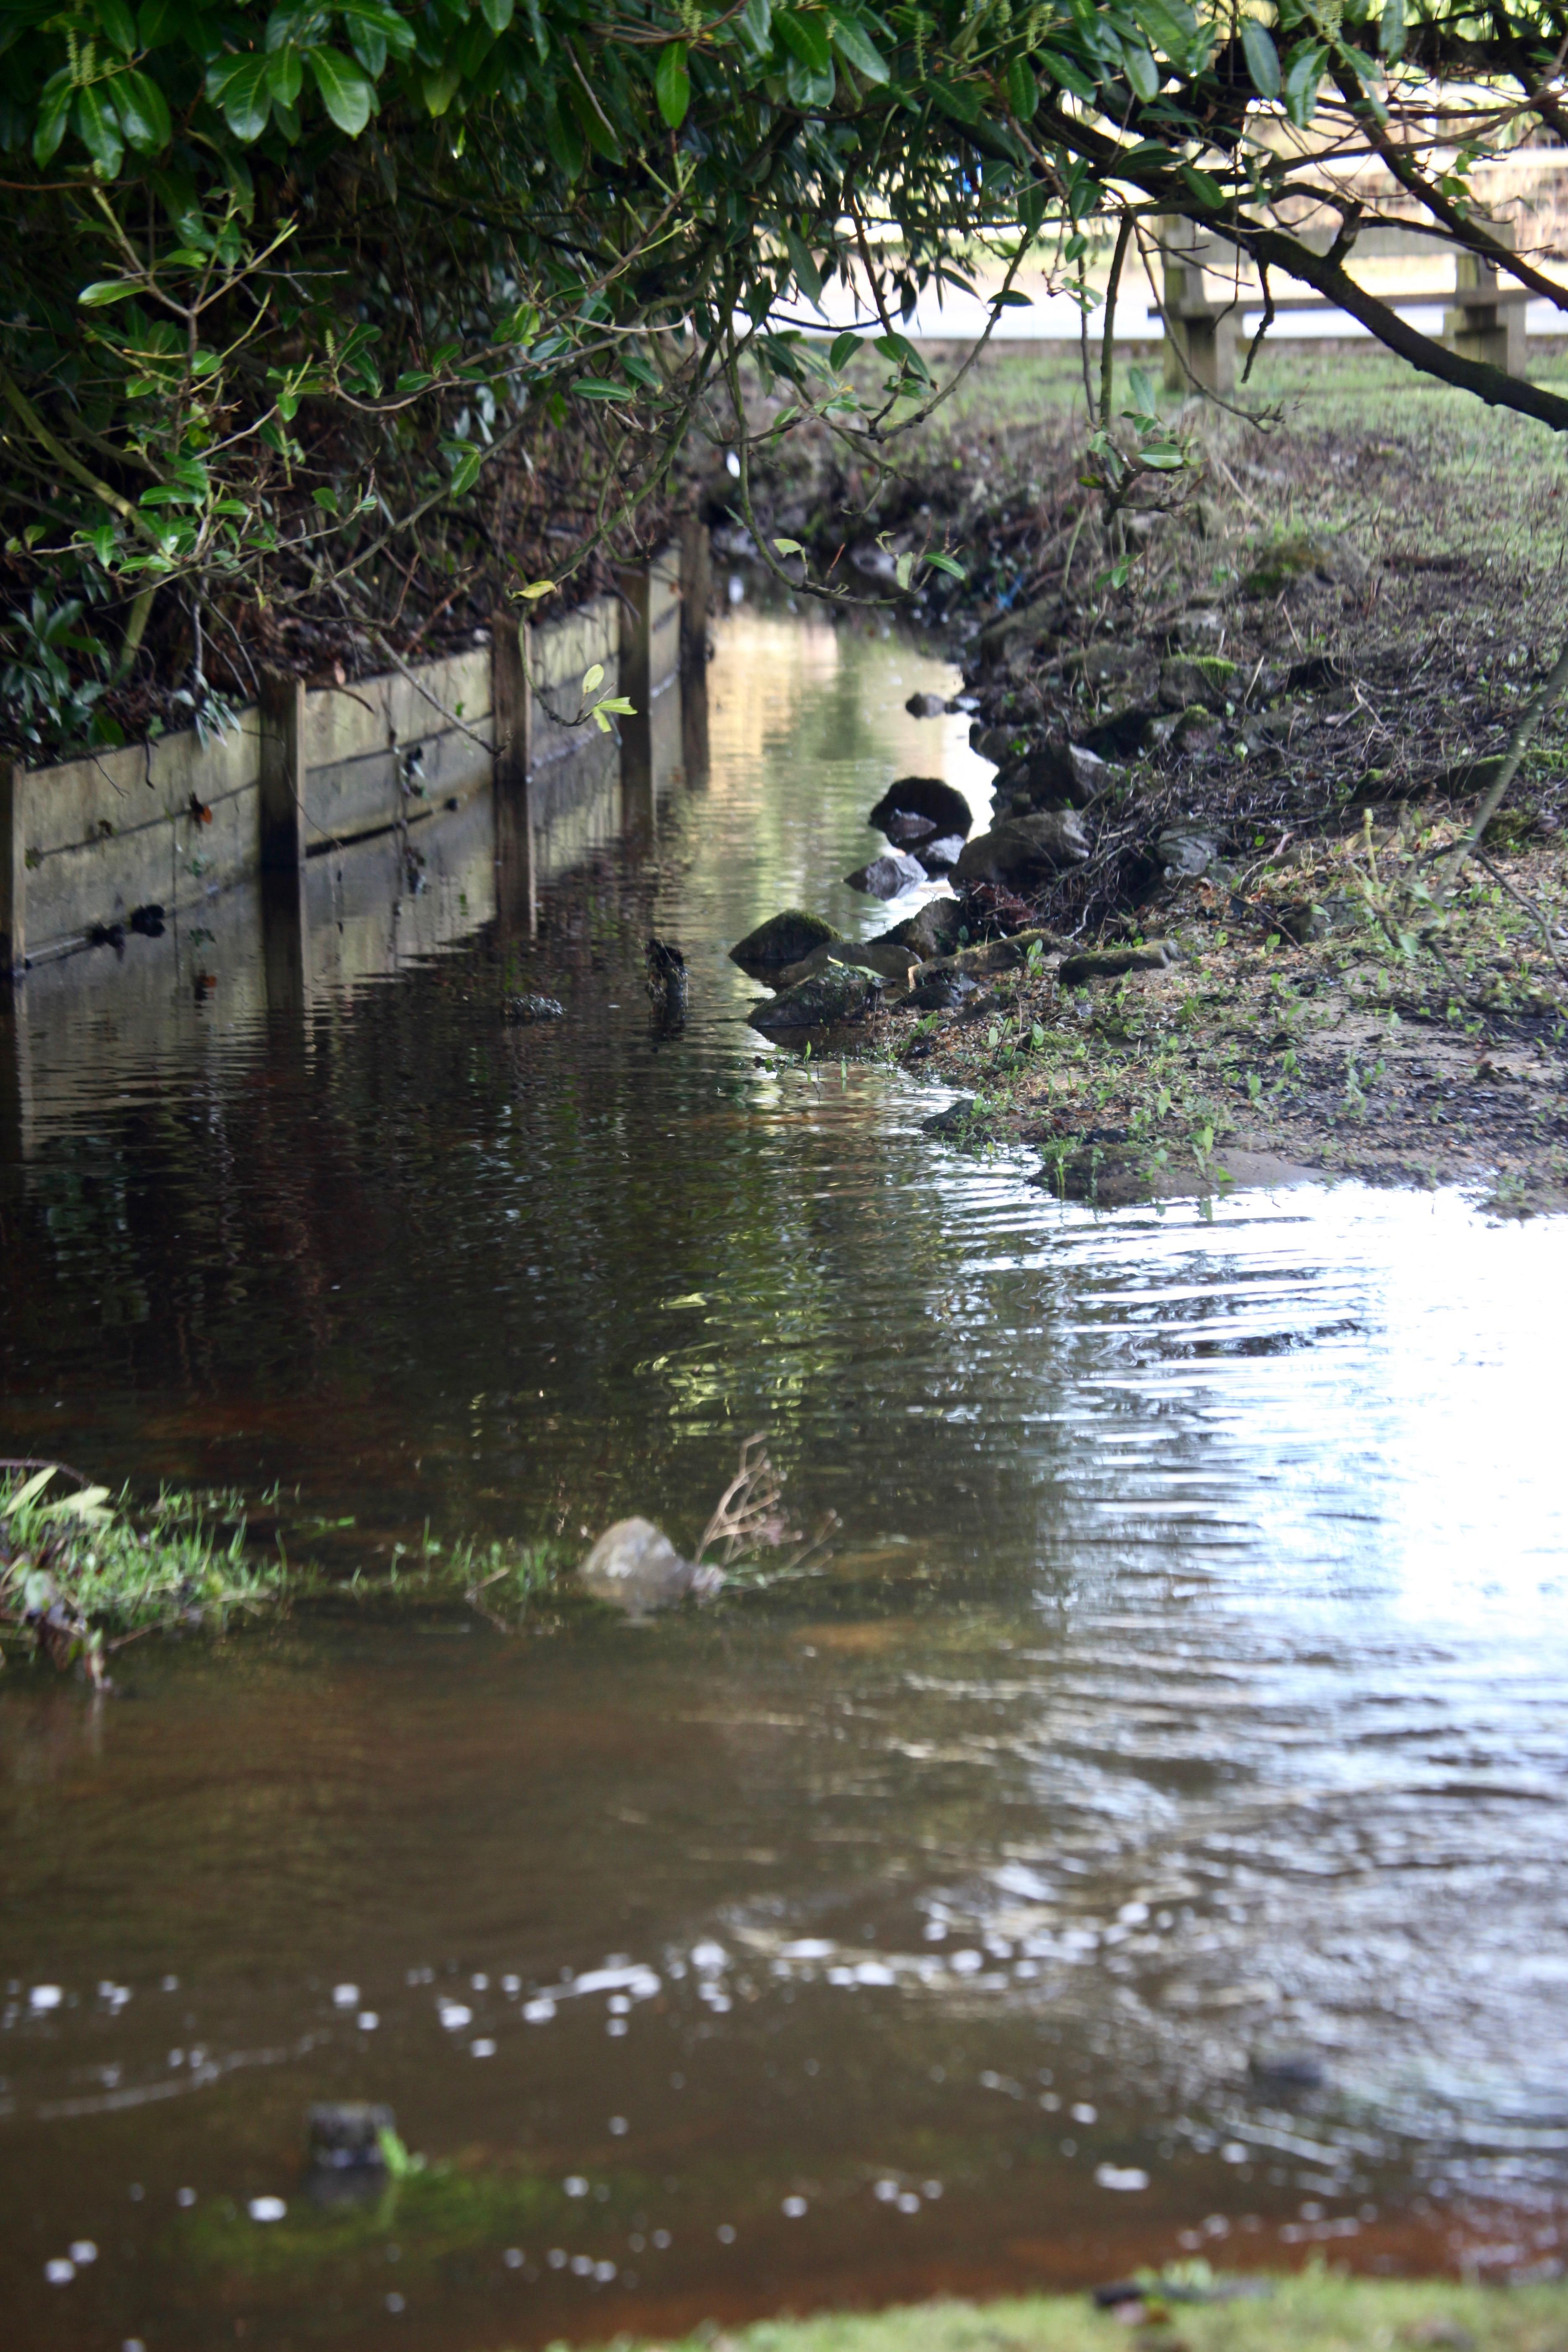 Flooded verge